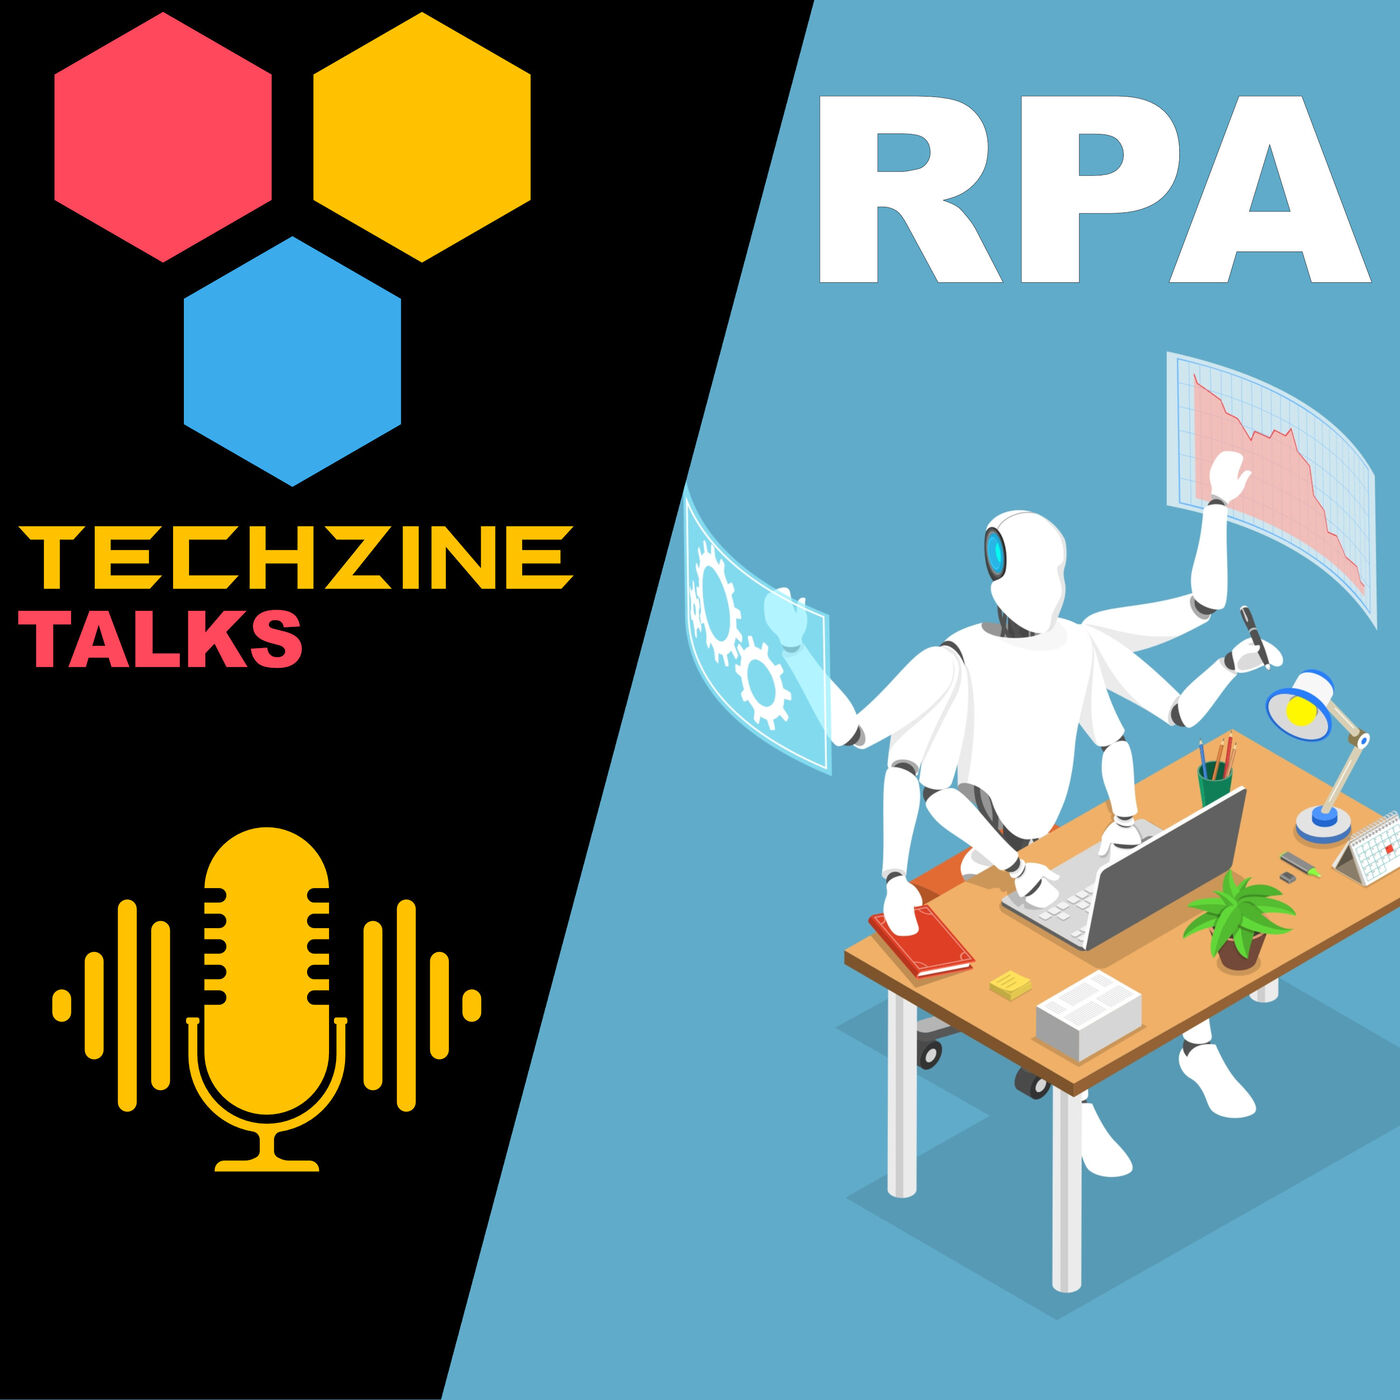 RPA - Robotic Process Automation